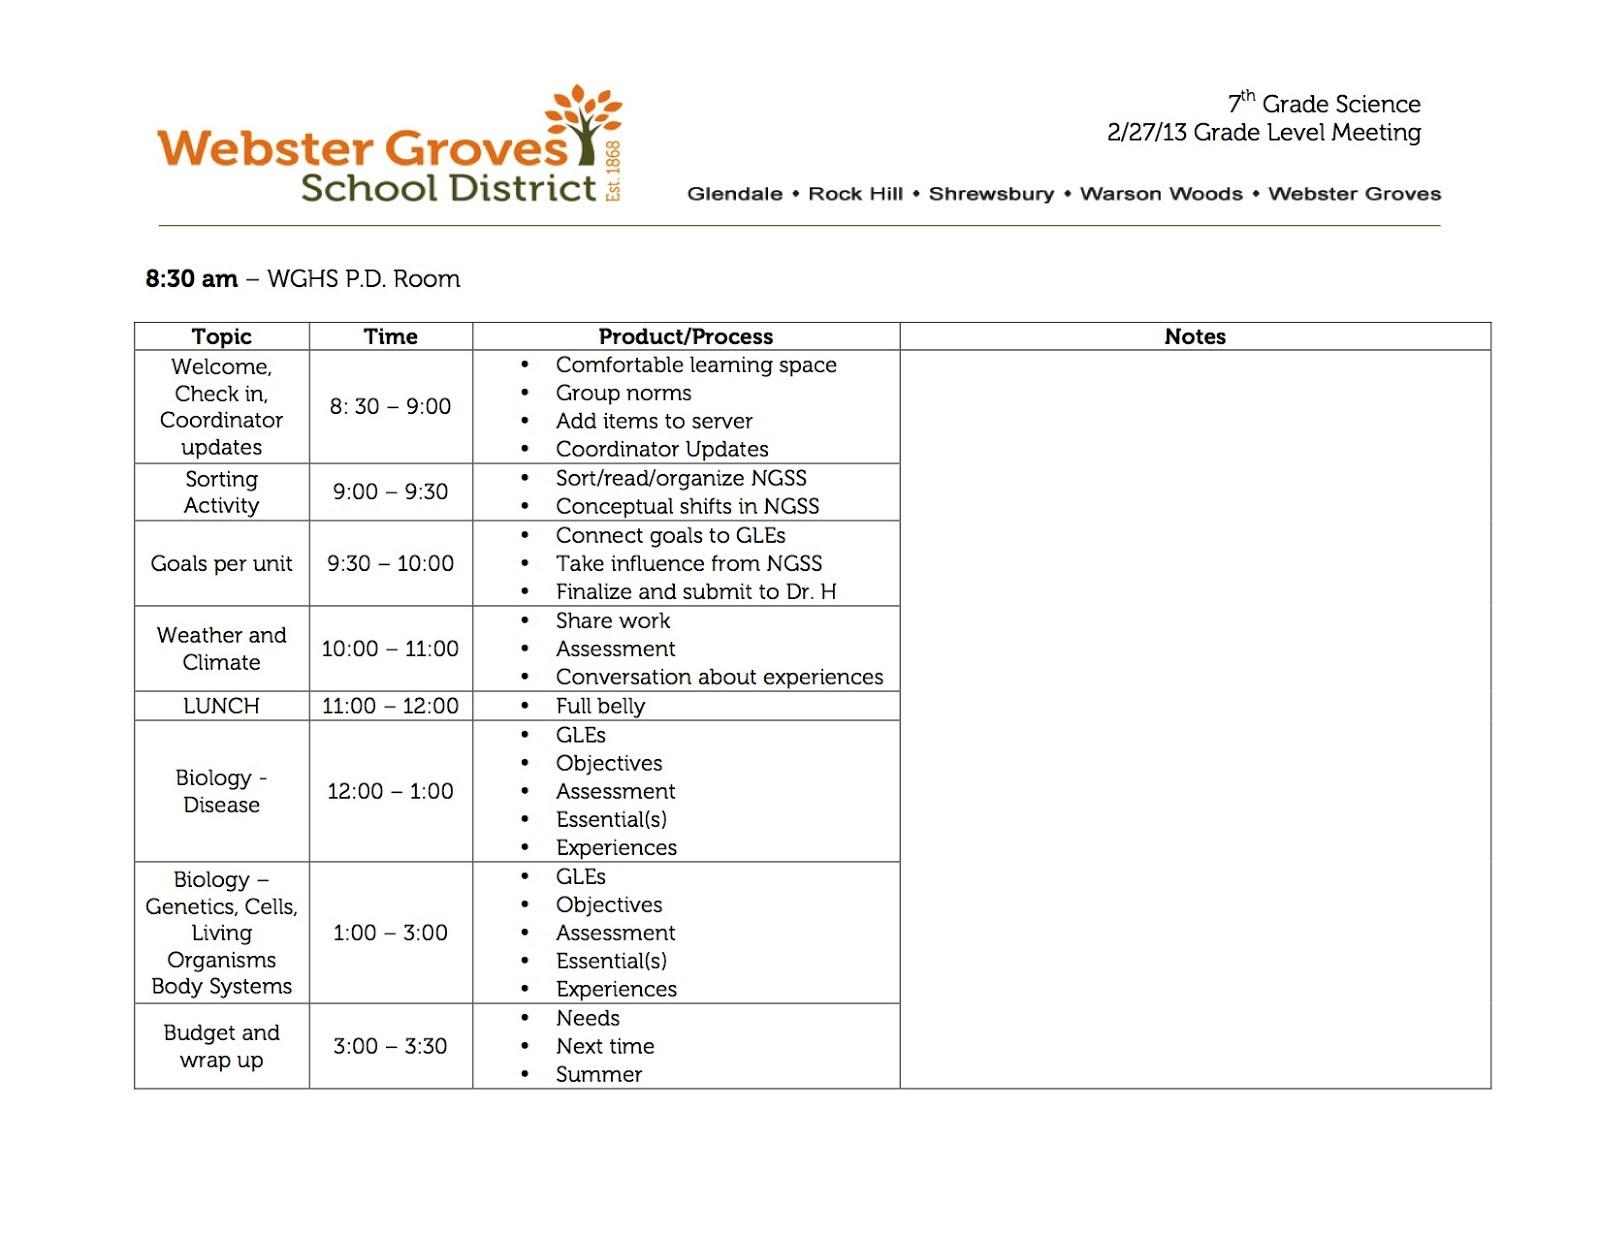 Free Worksheet Glencoe Life Science Worksheets glencoe mcgraw hill science worksheets answers delibertad biology html hill